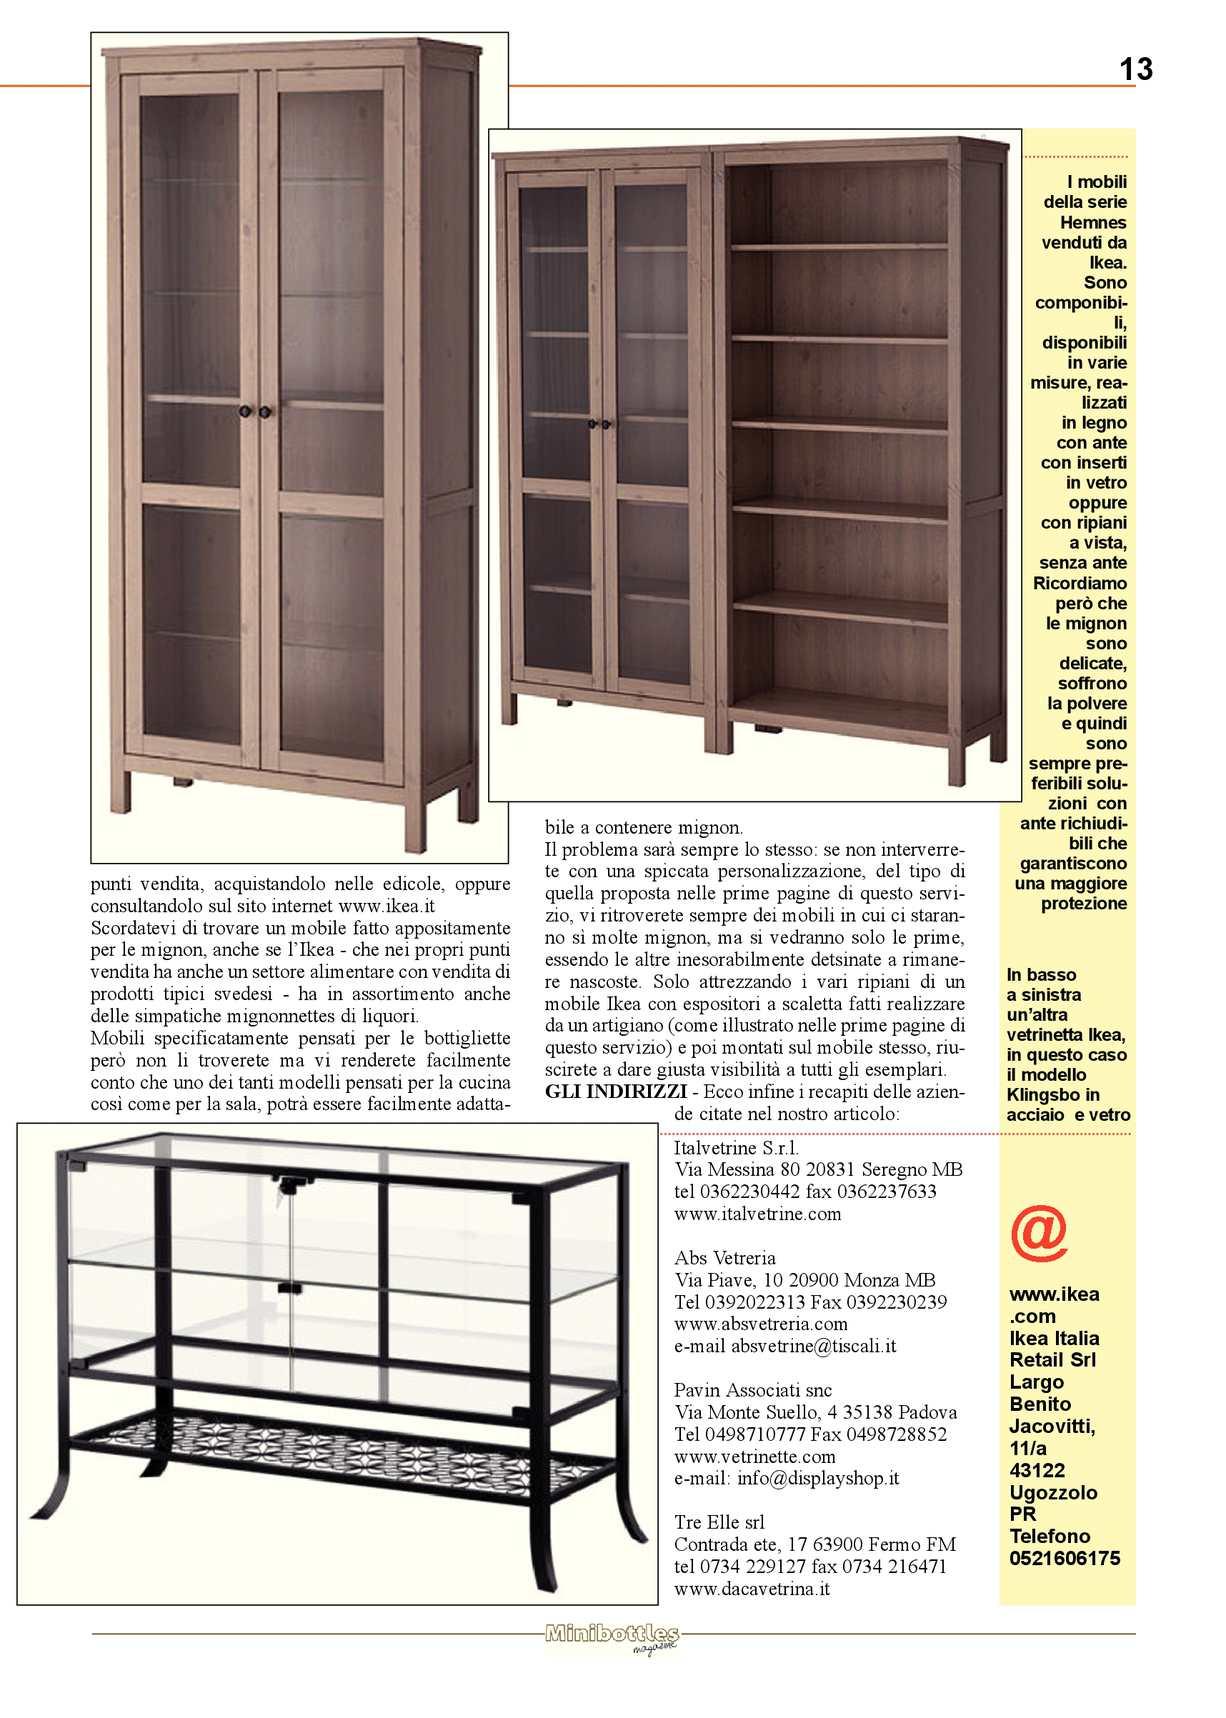 Minibottles Magazine 2013 04 Calameo Downloader